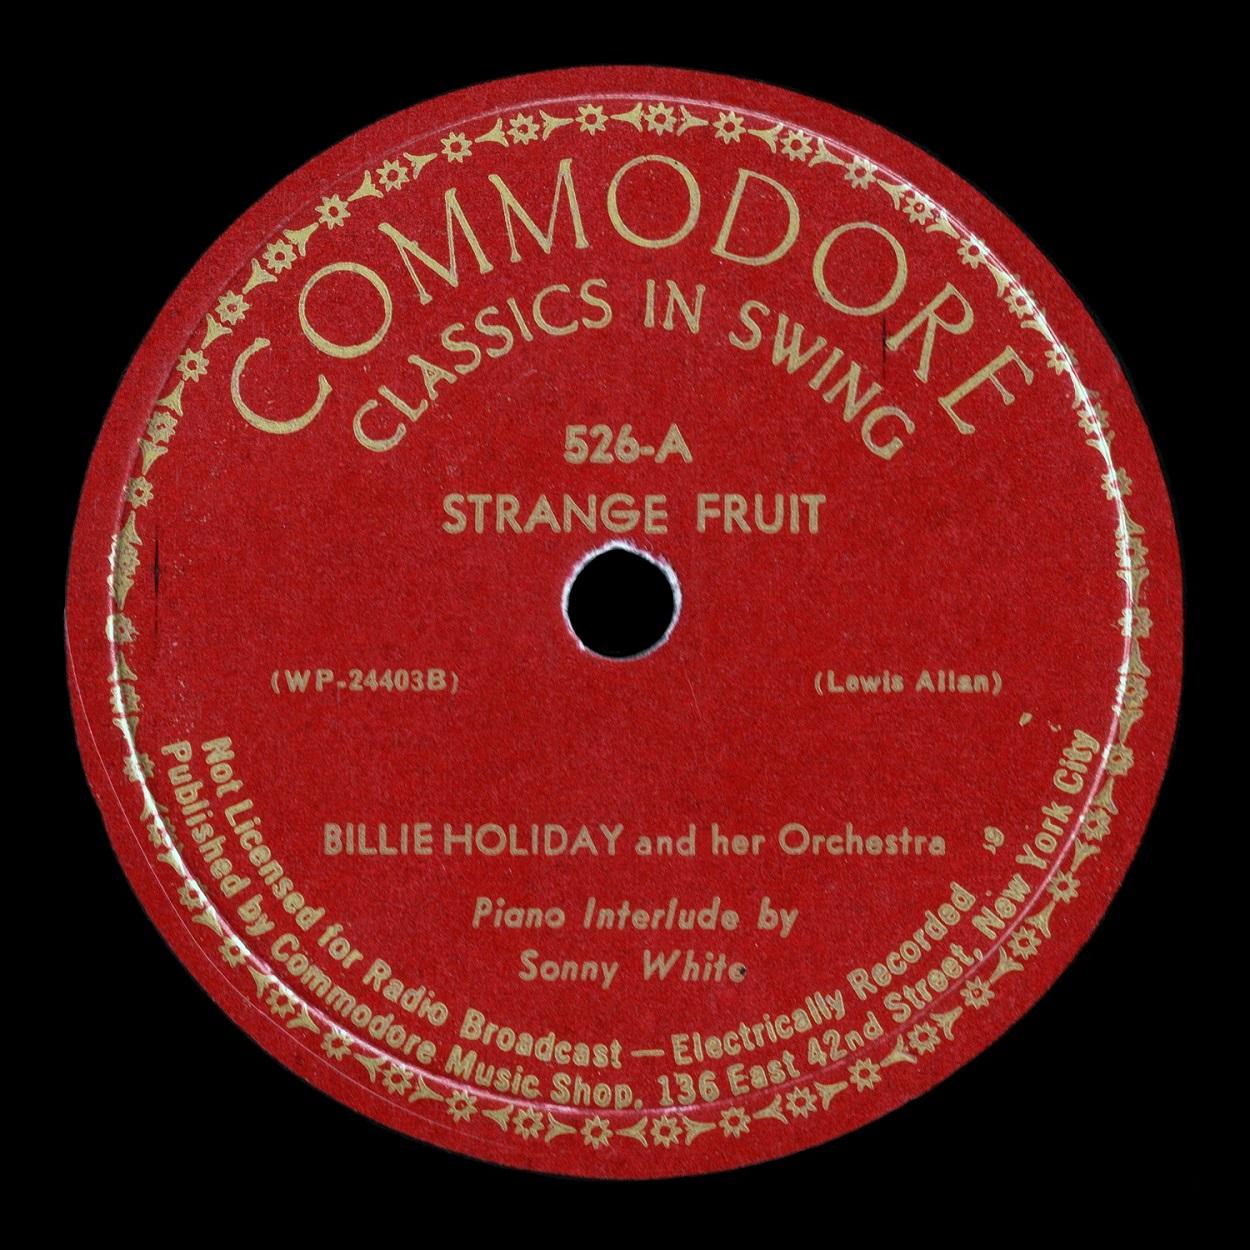 Strange Fruit - Commodore 1939 - Billie Holiday